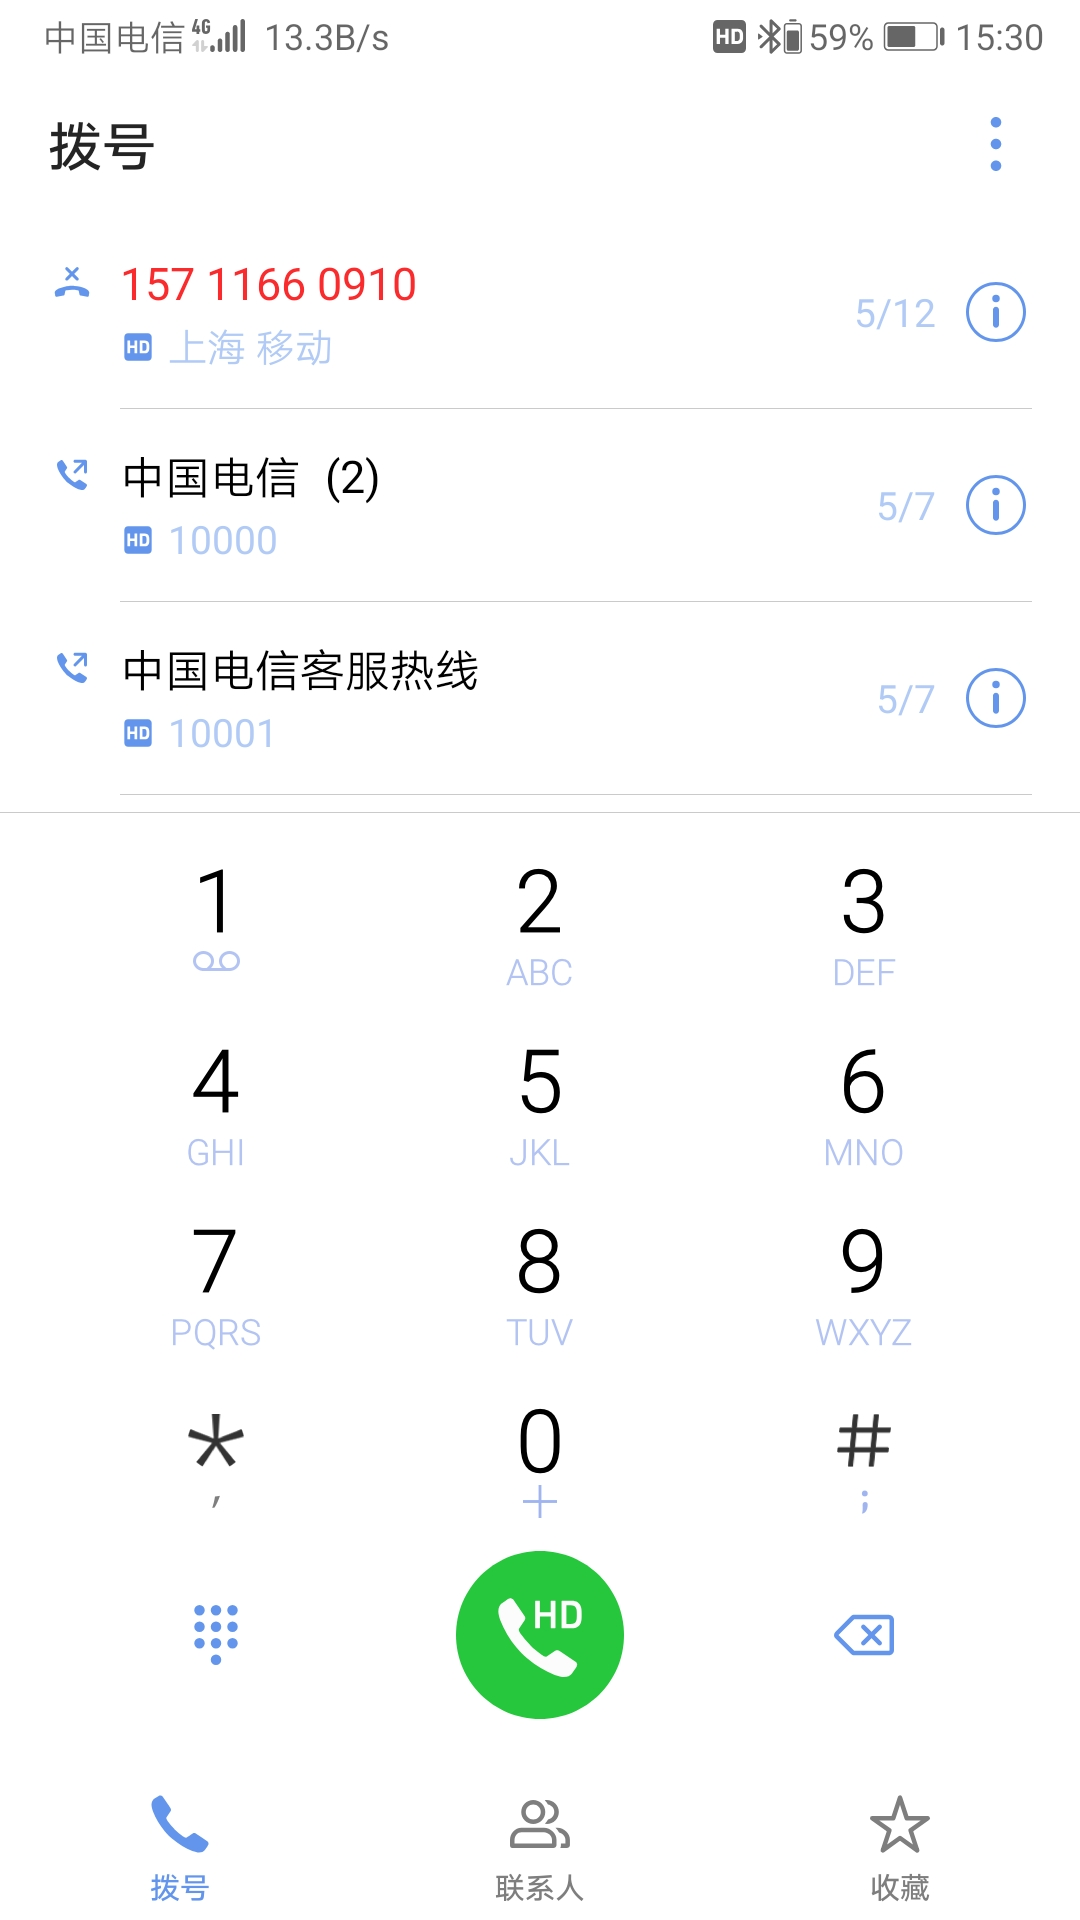 Screenshot_20190520_153100_com.android.contacts.jpg